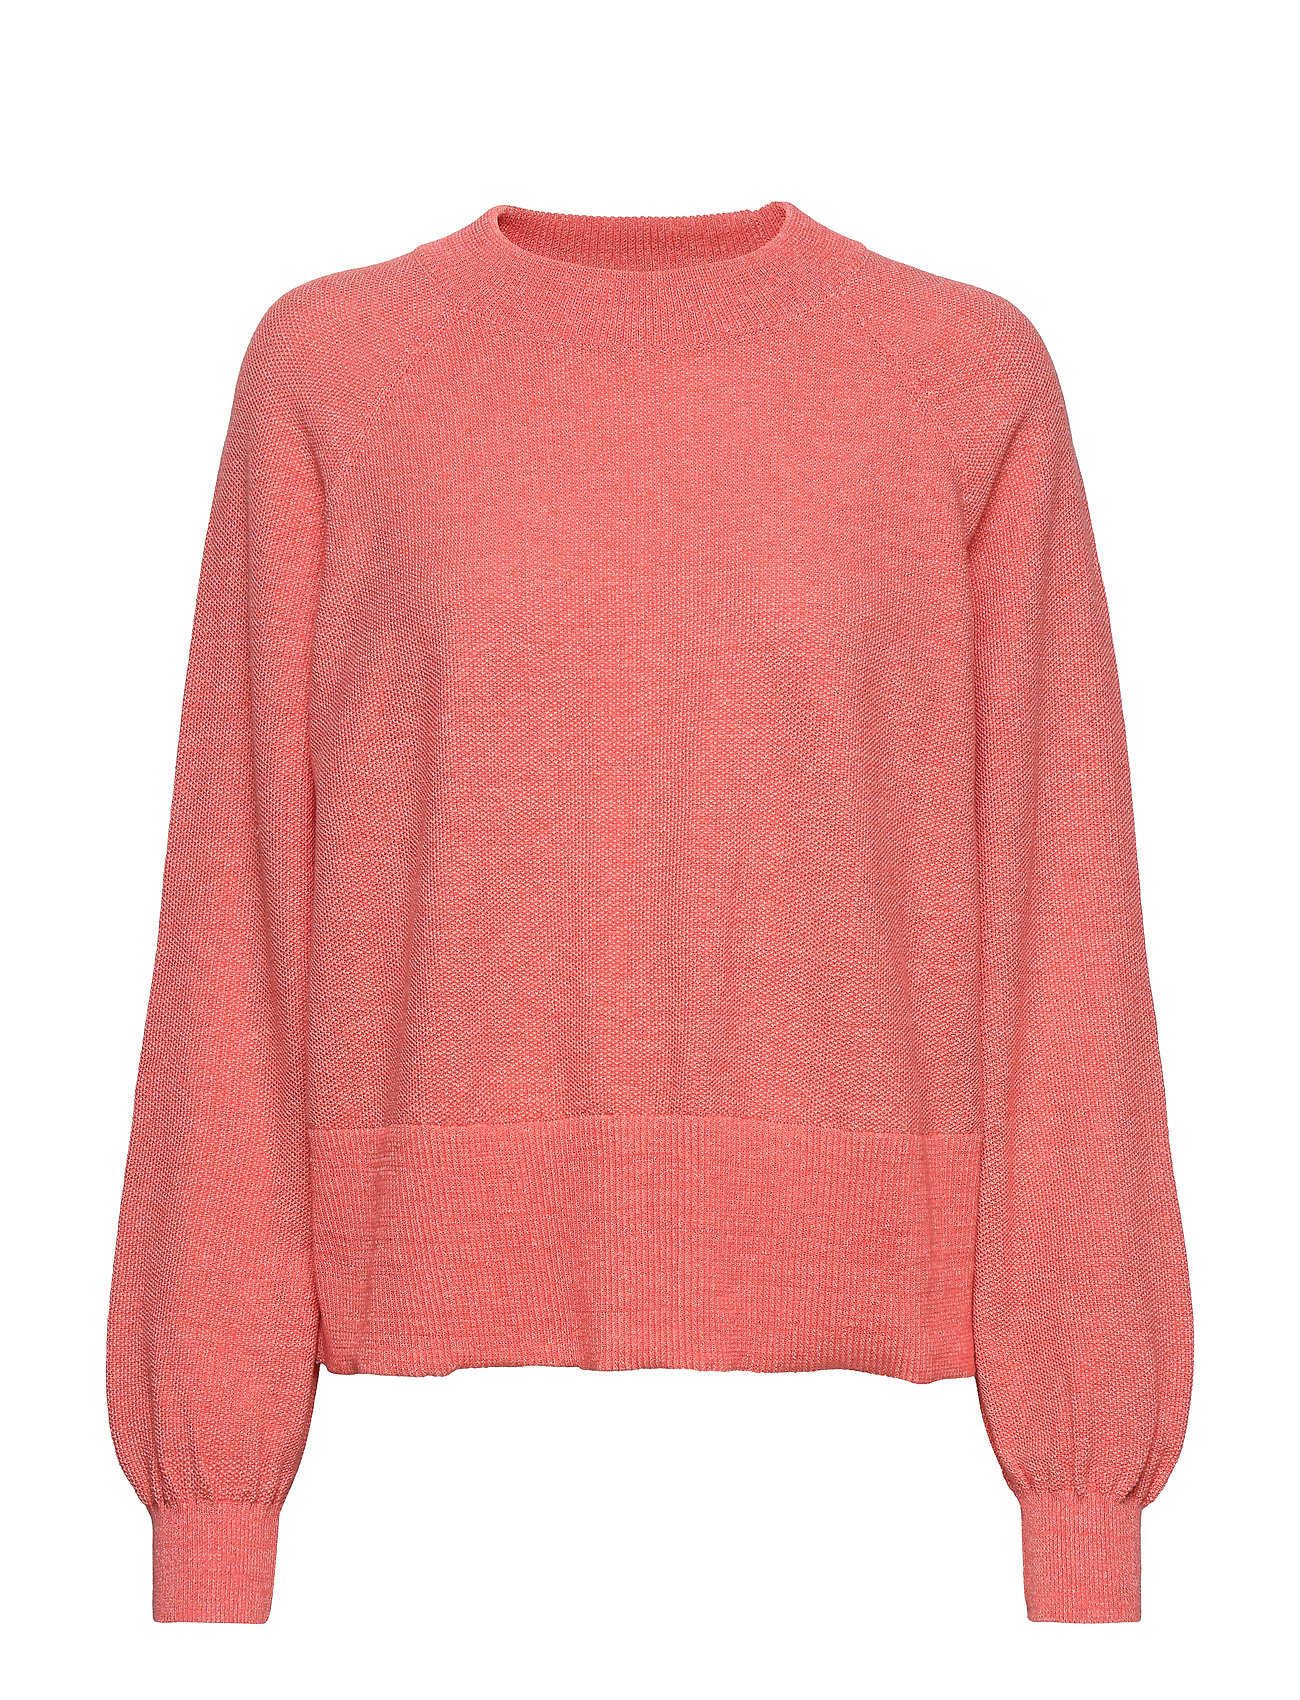 Marimekko VIHANTA Knitted Pullover - MELANGE PEACH